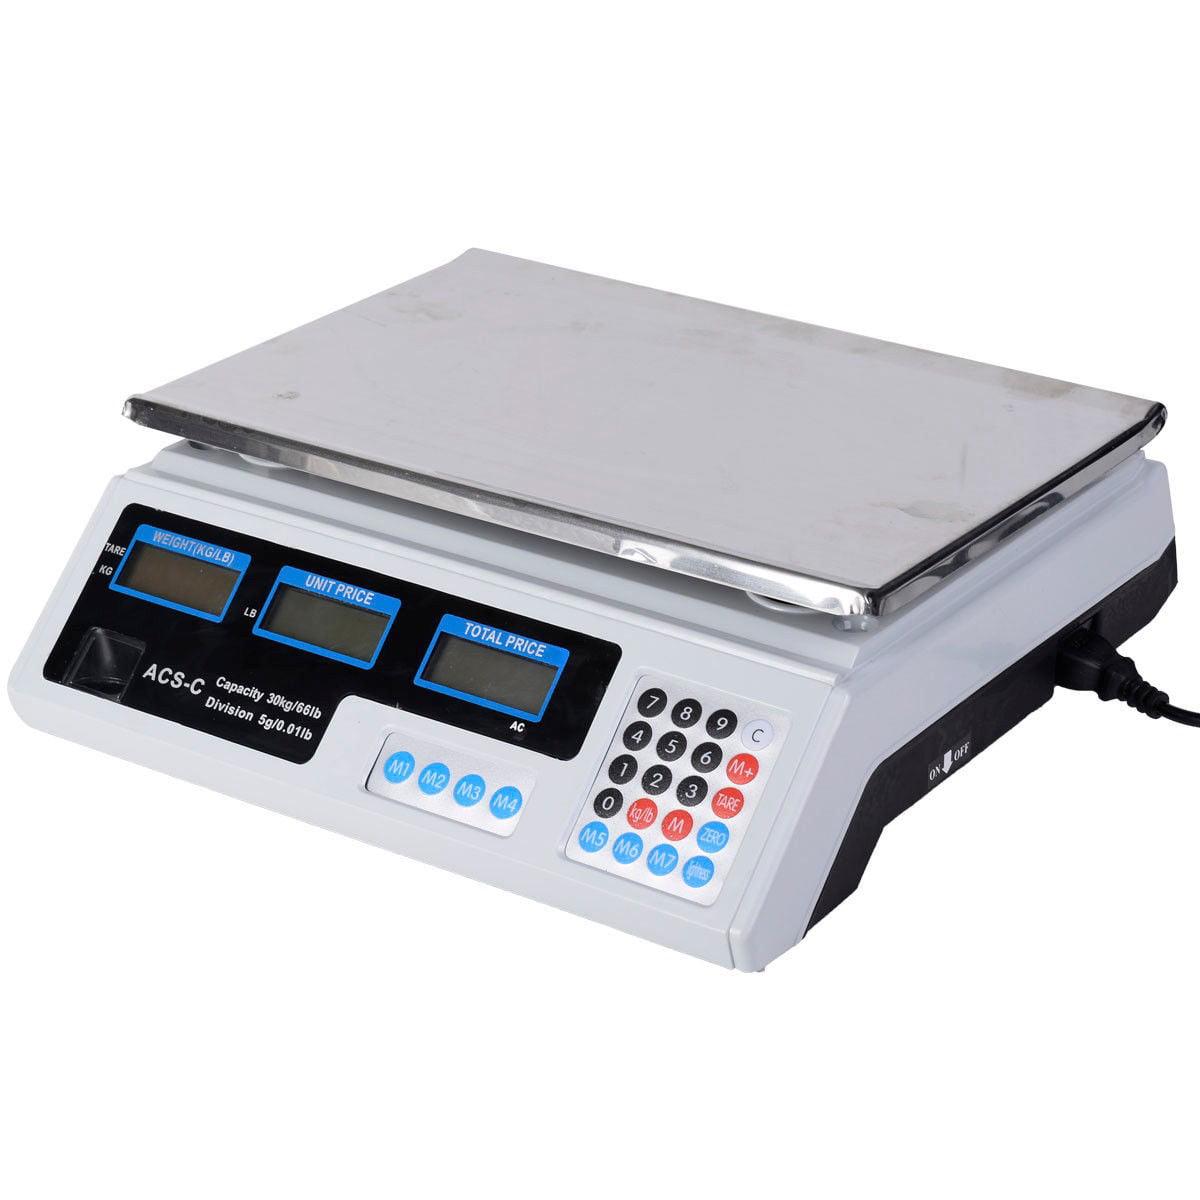 66 LB Digital Scale Price Computing Deli Food Produce Electronic ...